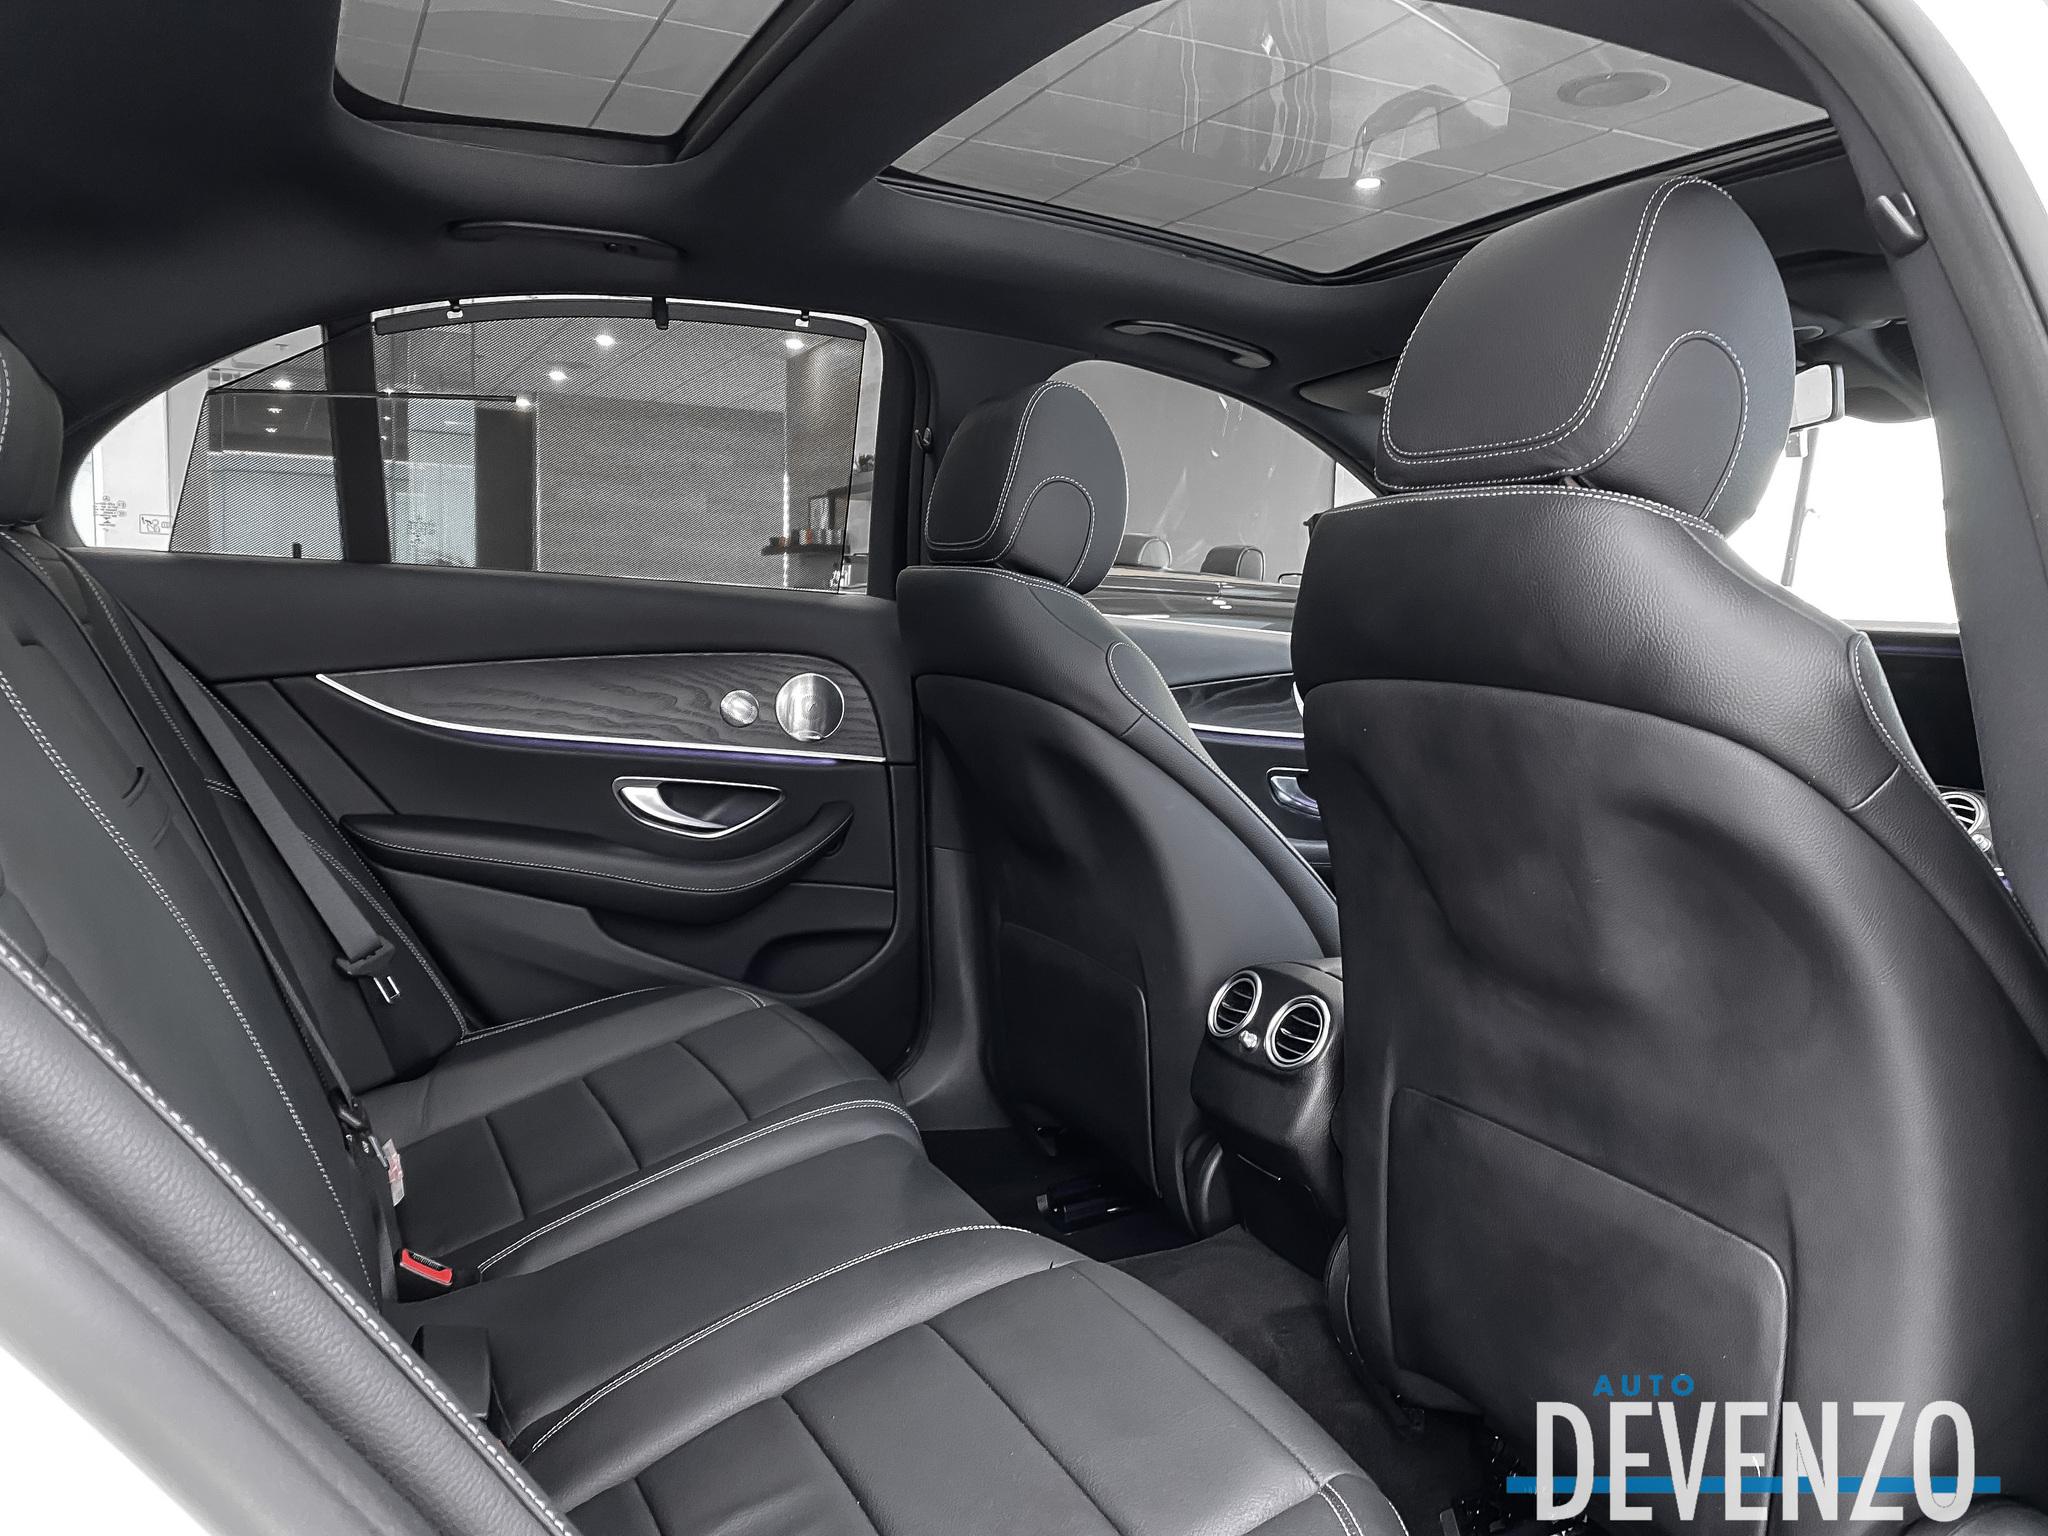 2017 Mercedes-Benz E-Class E400 4MATIC AMG SPORT PACKAGE – INTELLIGENT DRIVE complet